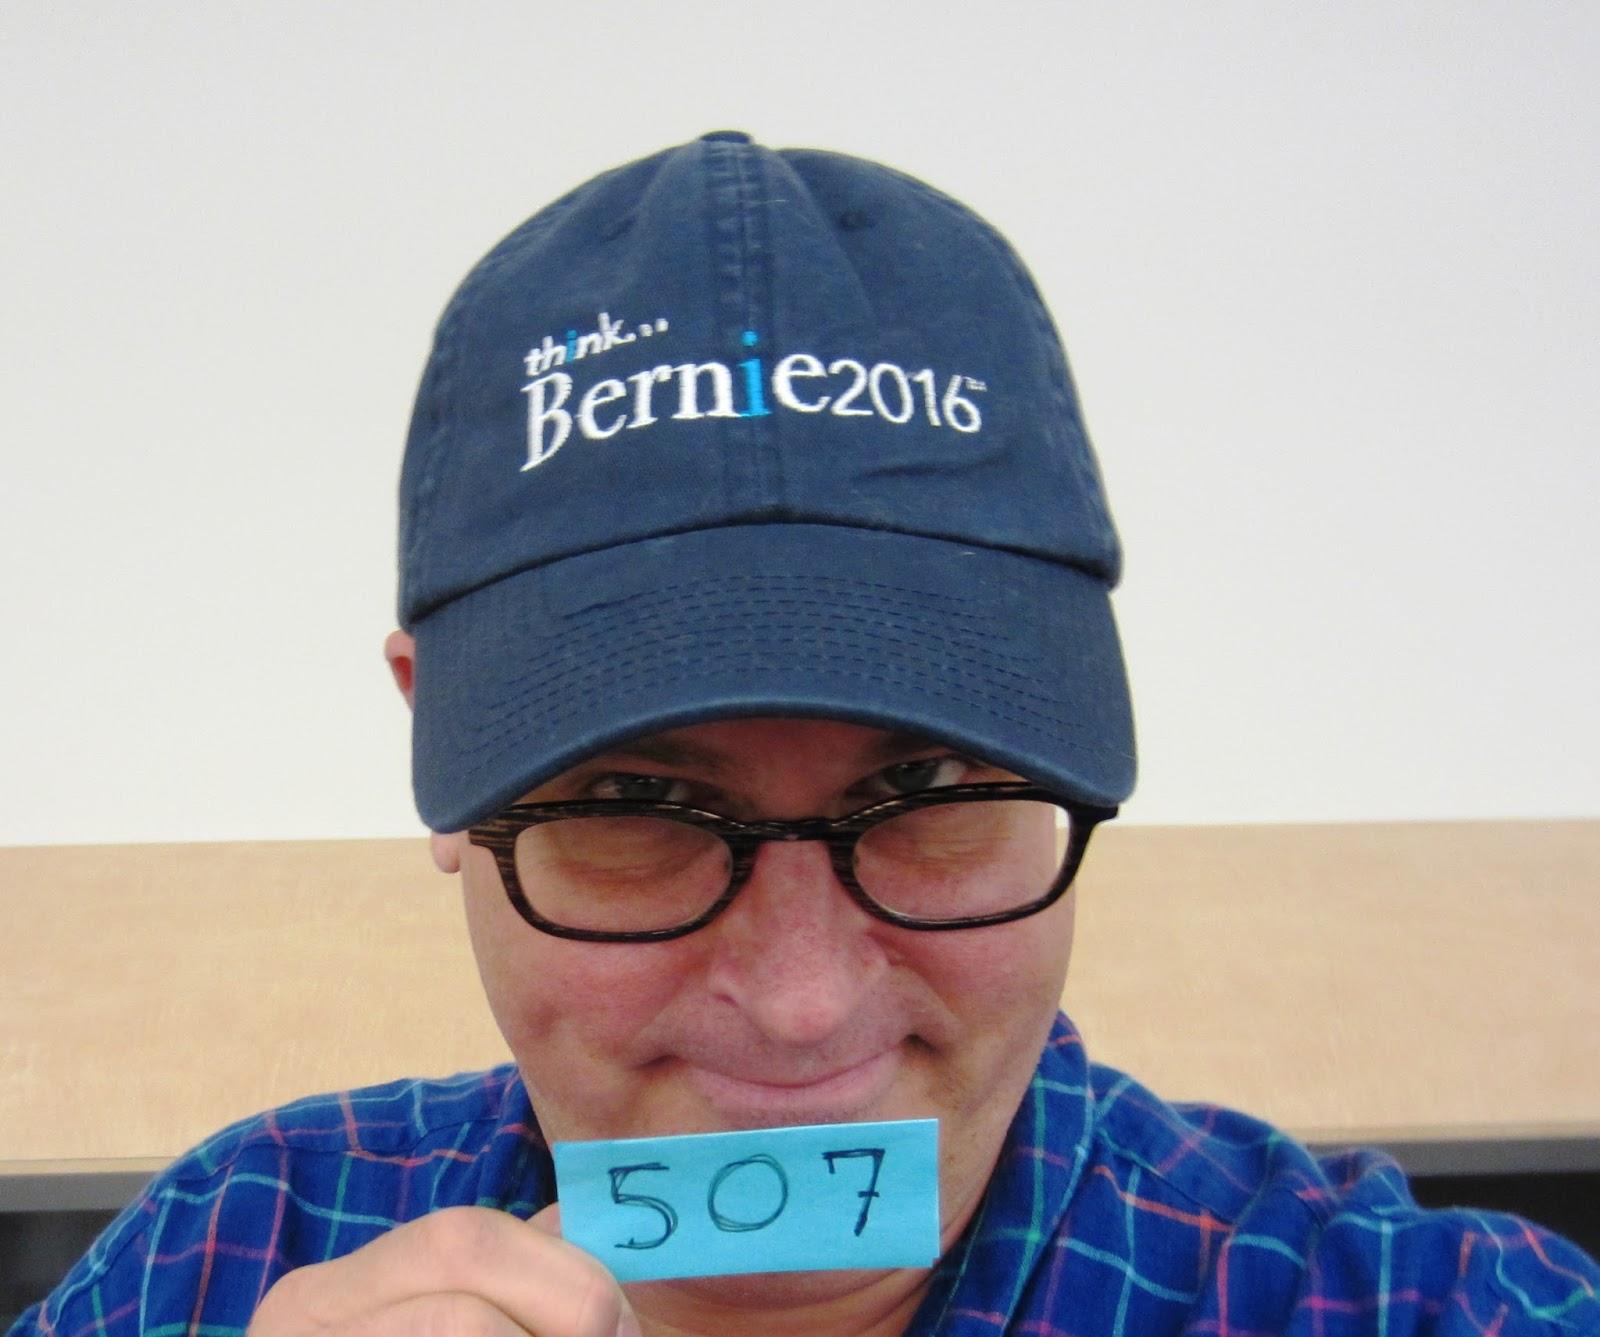 b4d170ba39d53 Post Cubbins  Hat 507 - Bernin  Down the House Edition